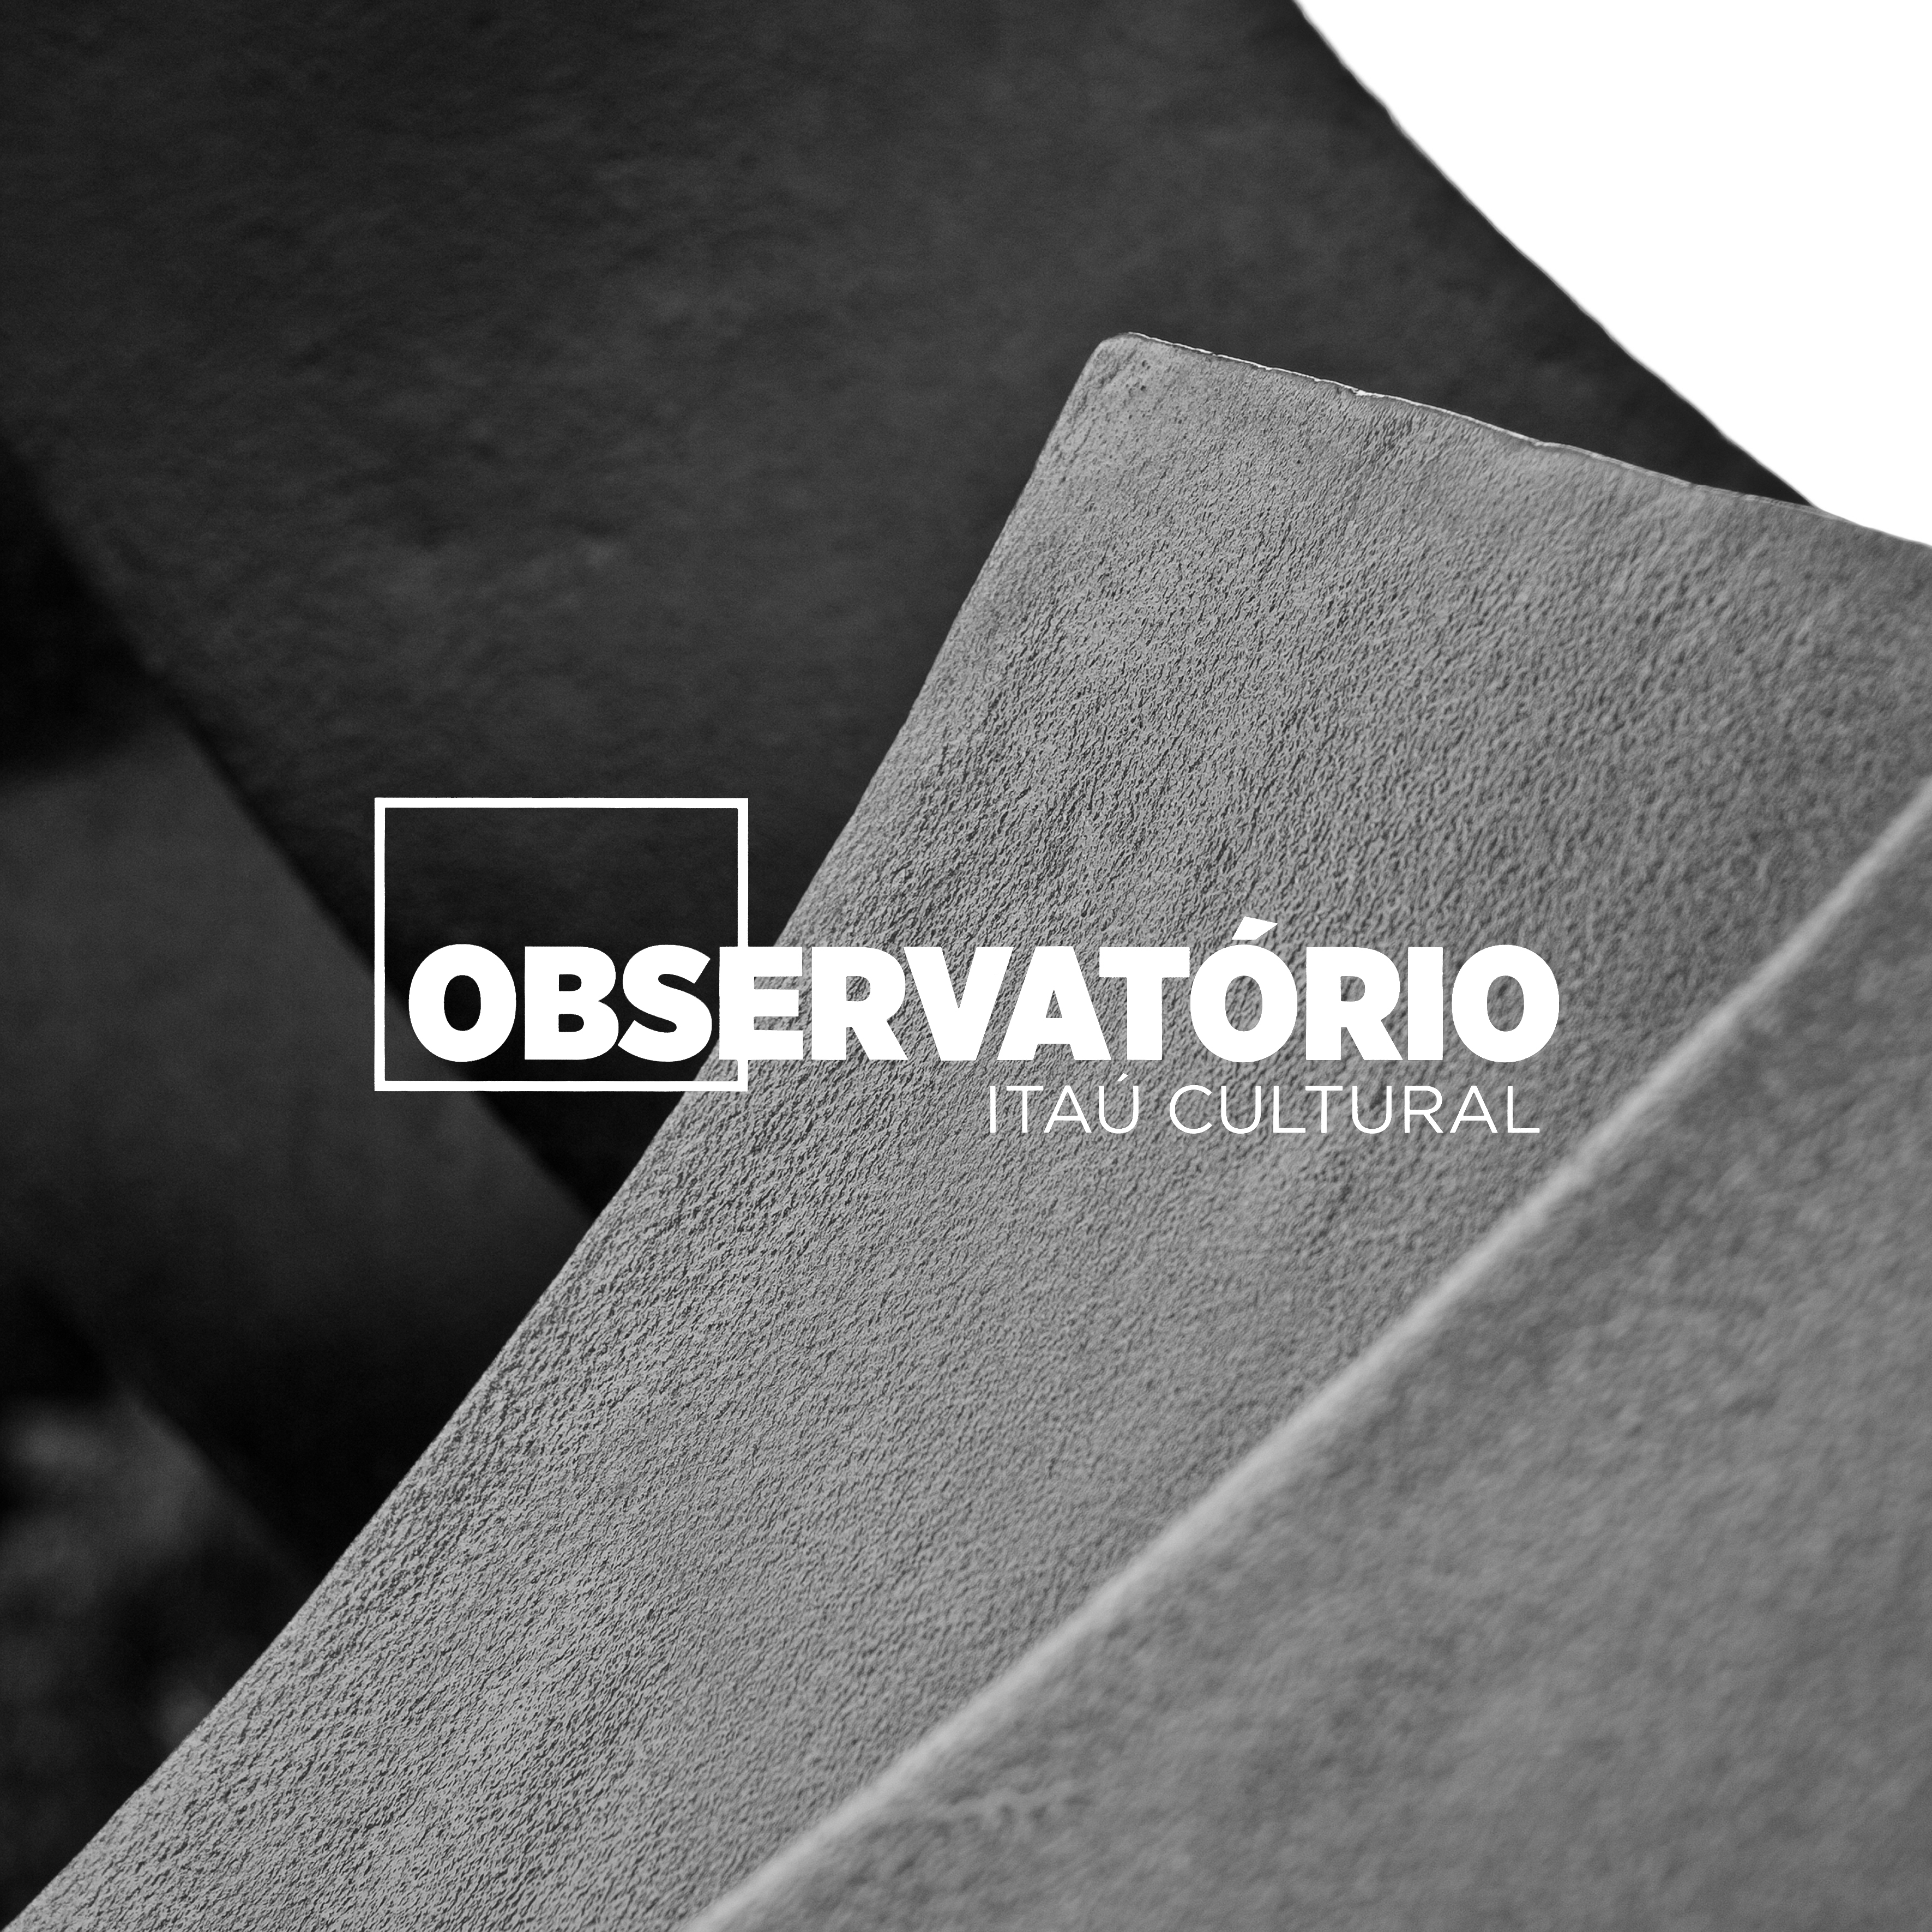 Observatório Itaú Cultural